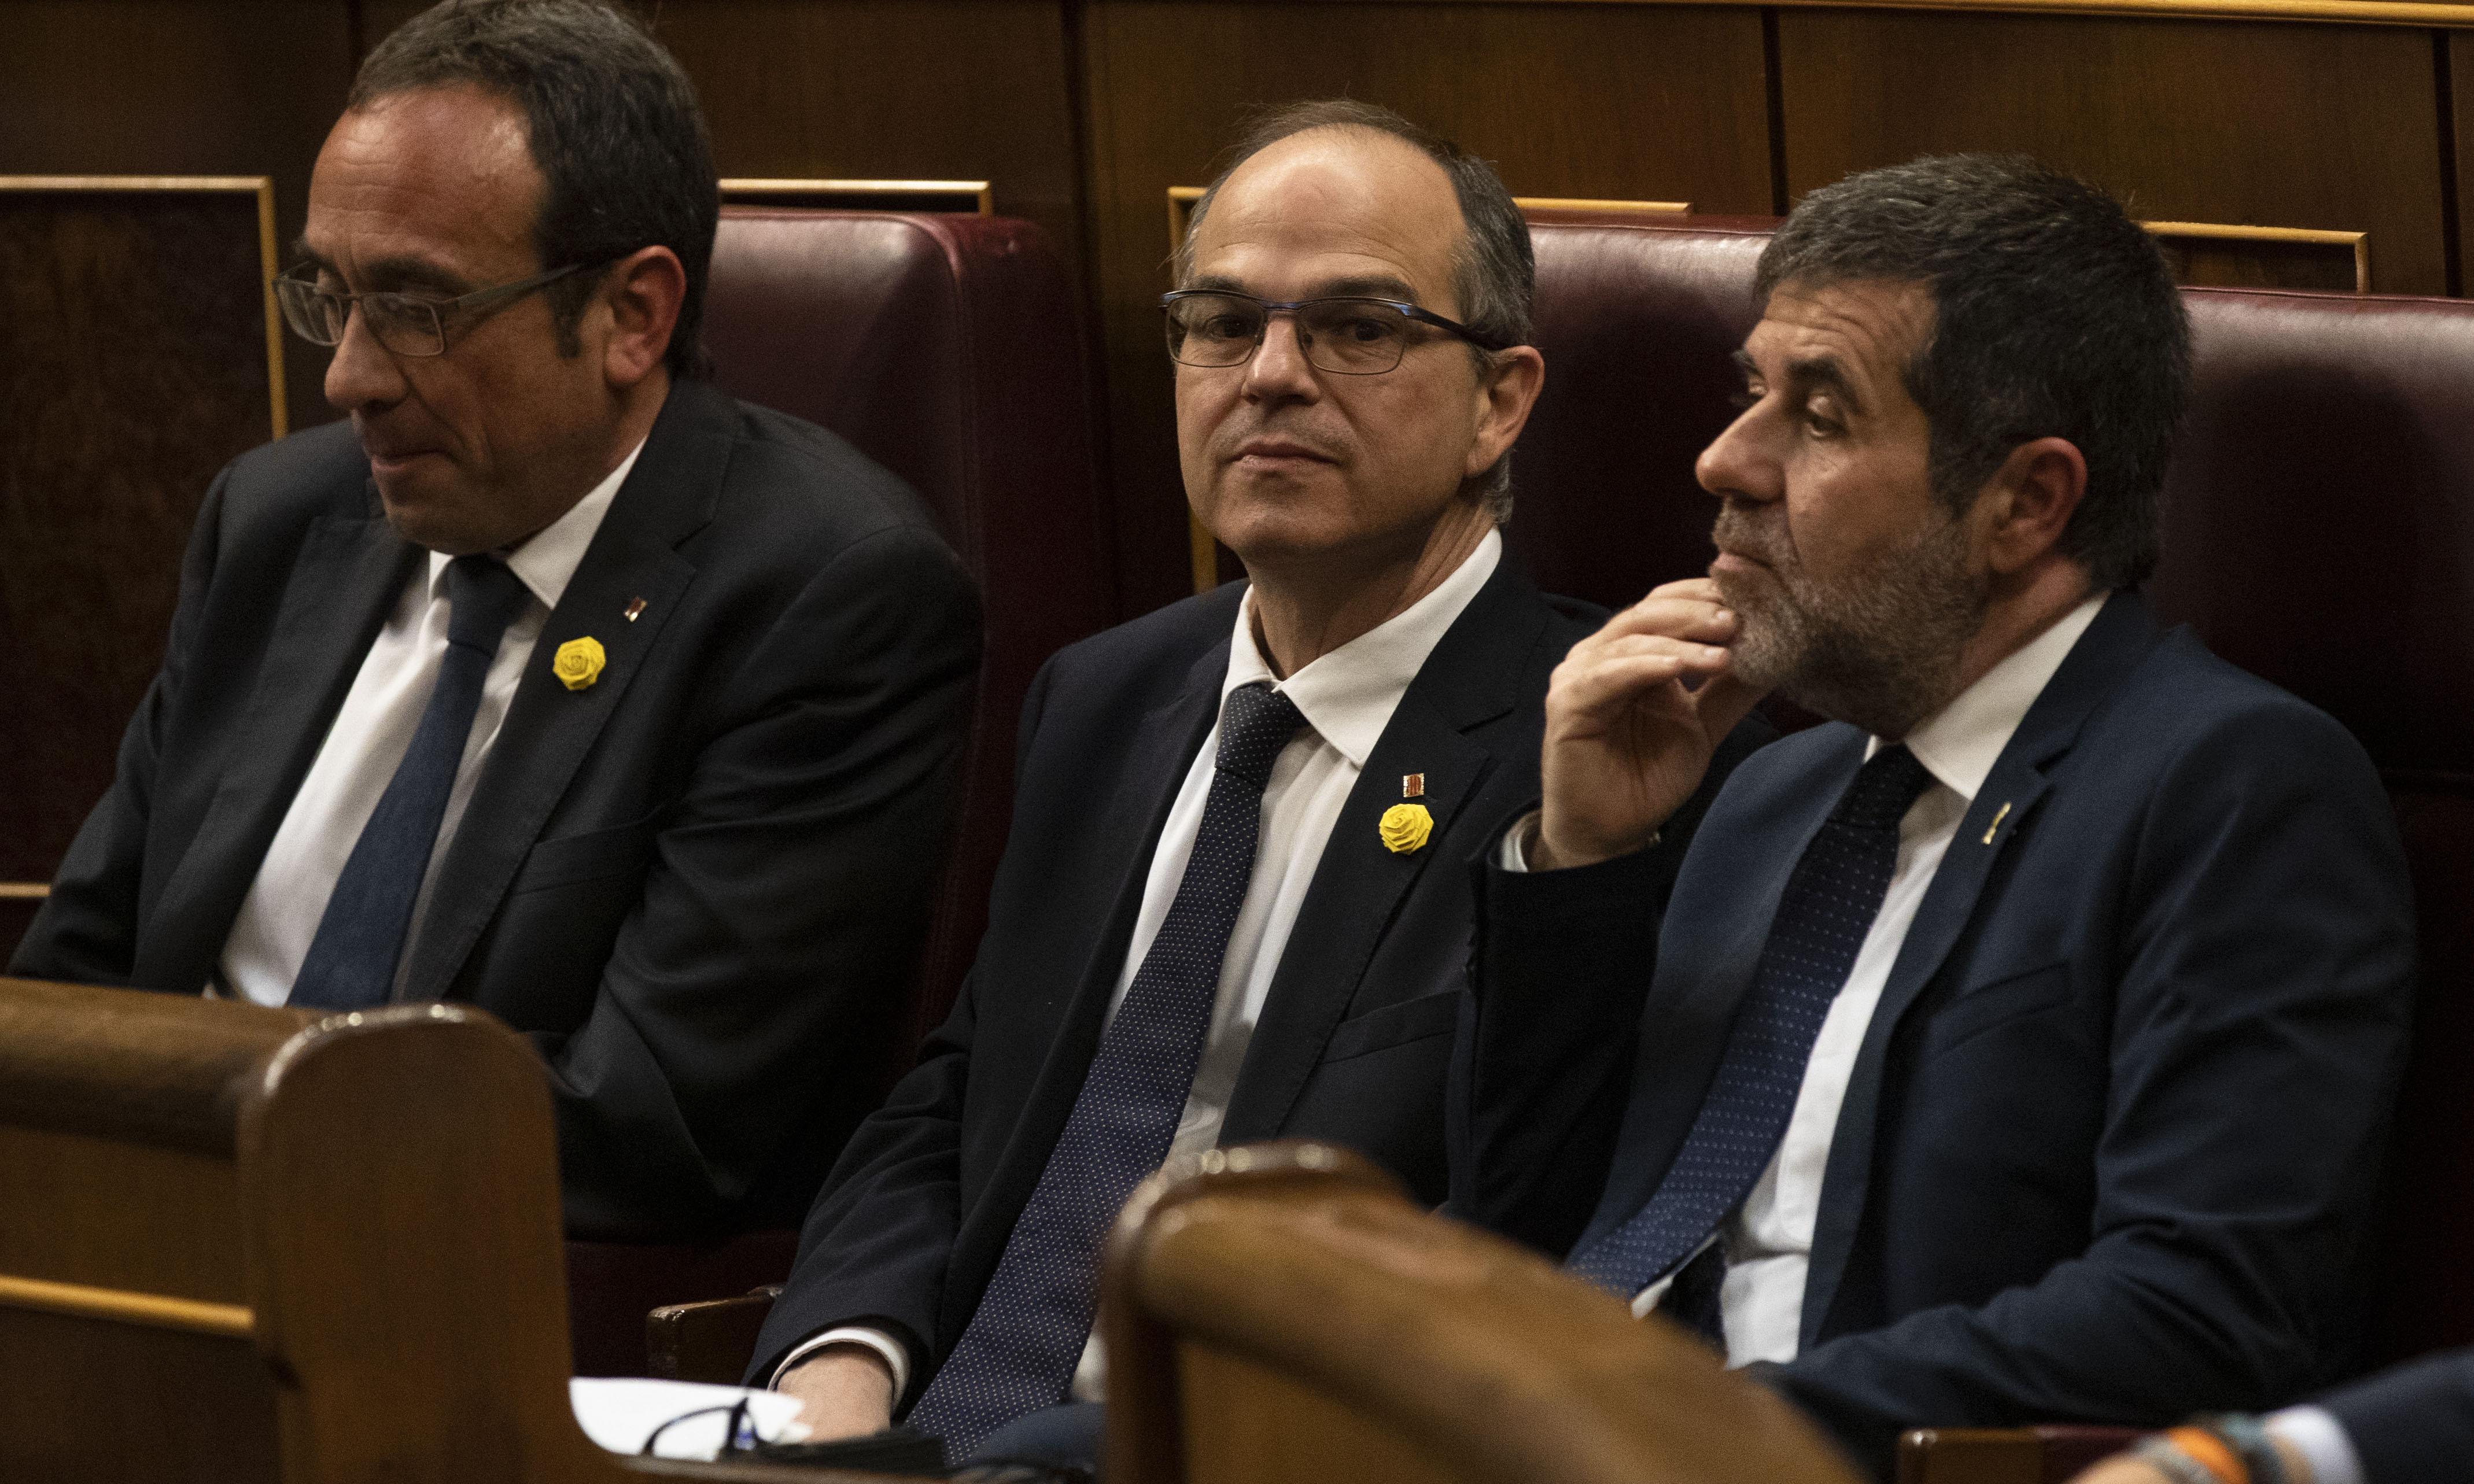 Jailed Catalan separatists take seats in Spanish parliament